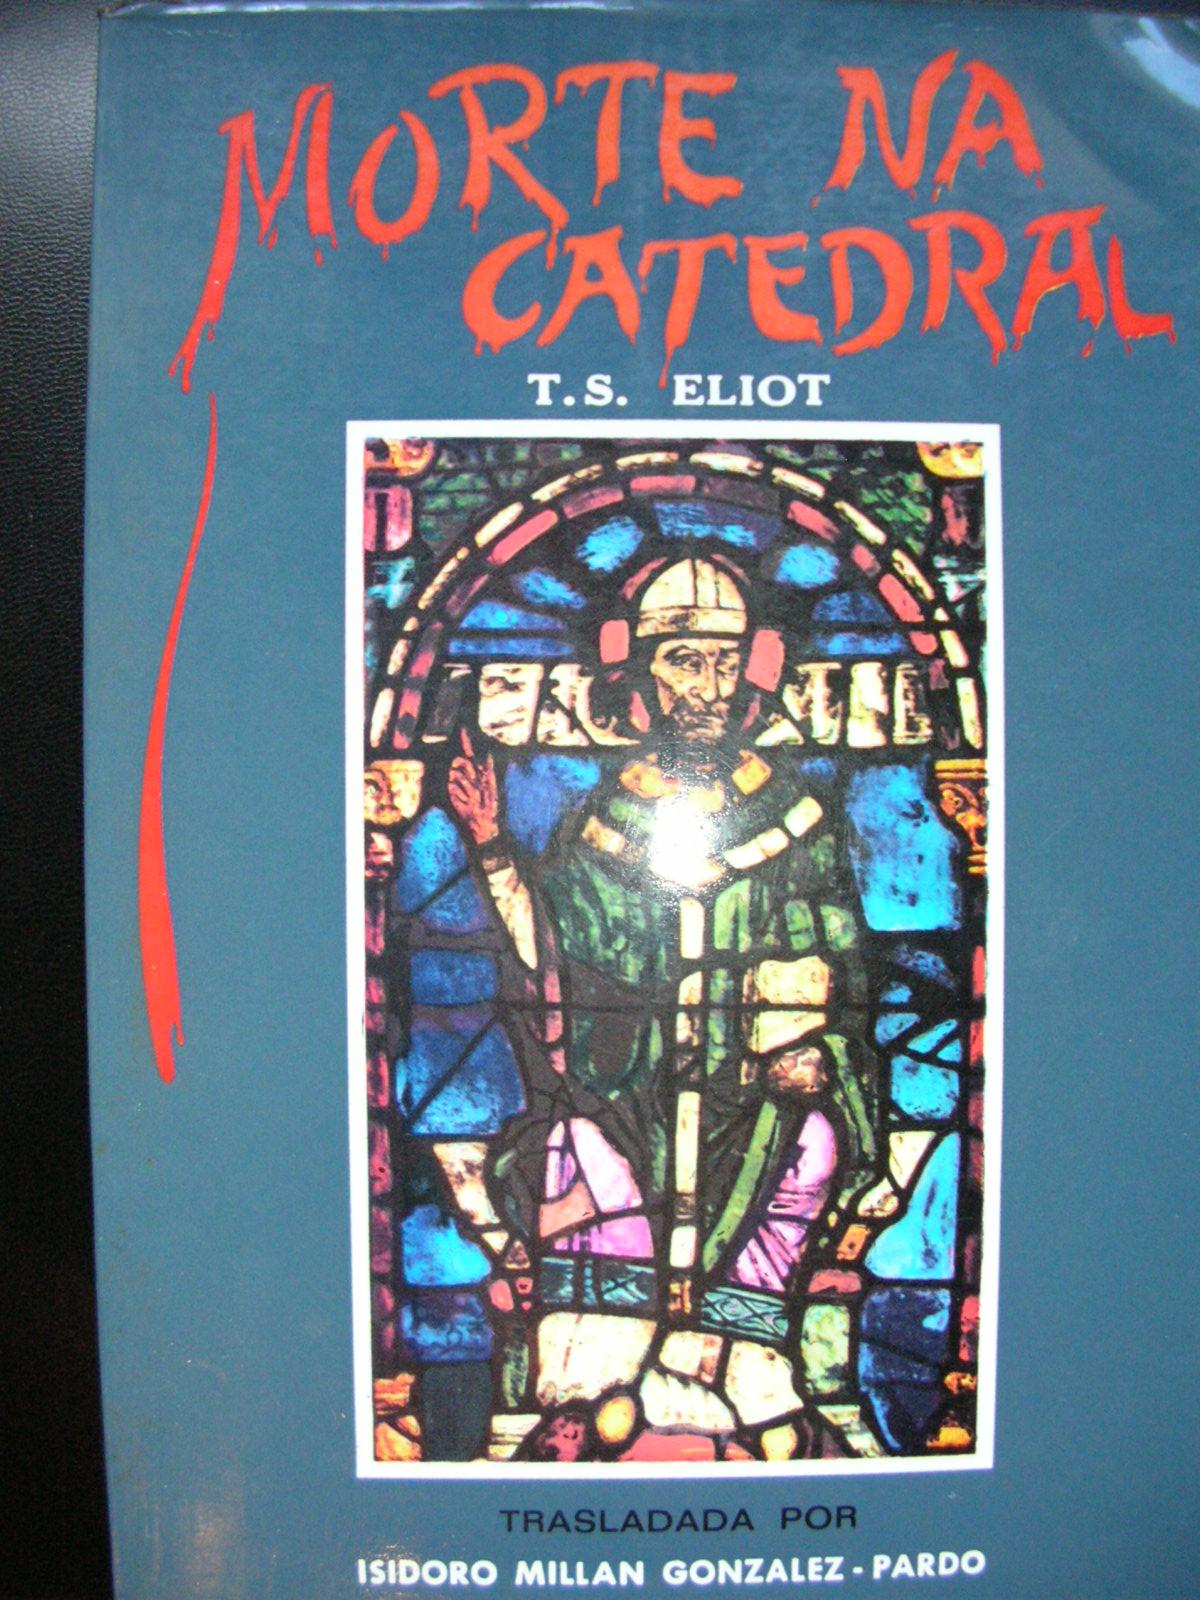 Morte na catedral